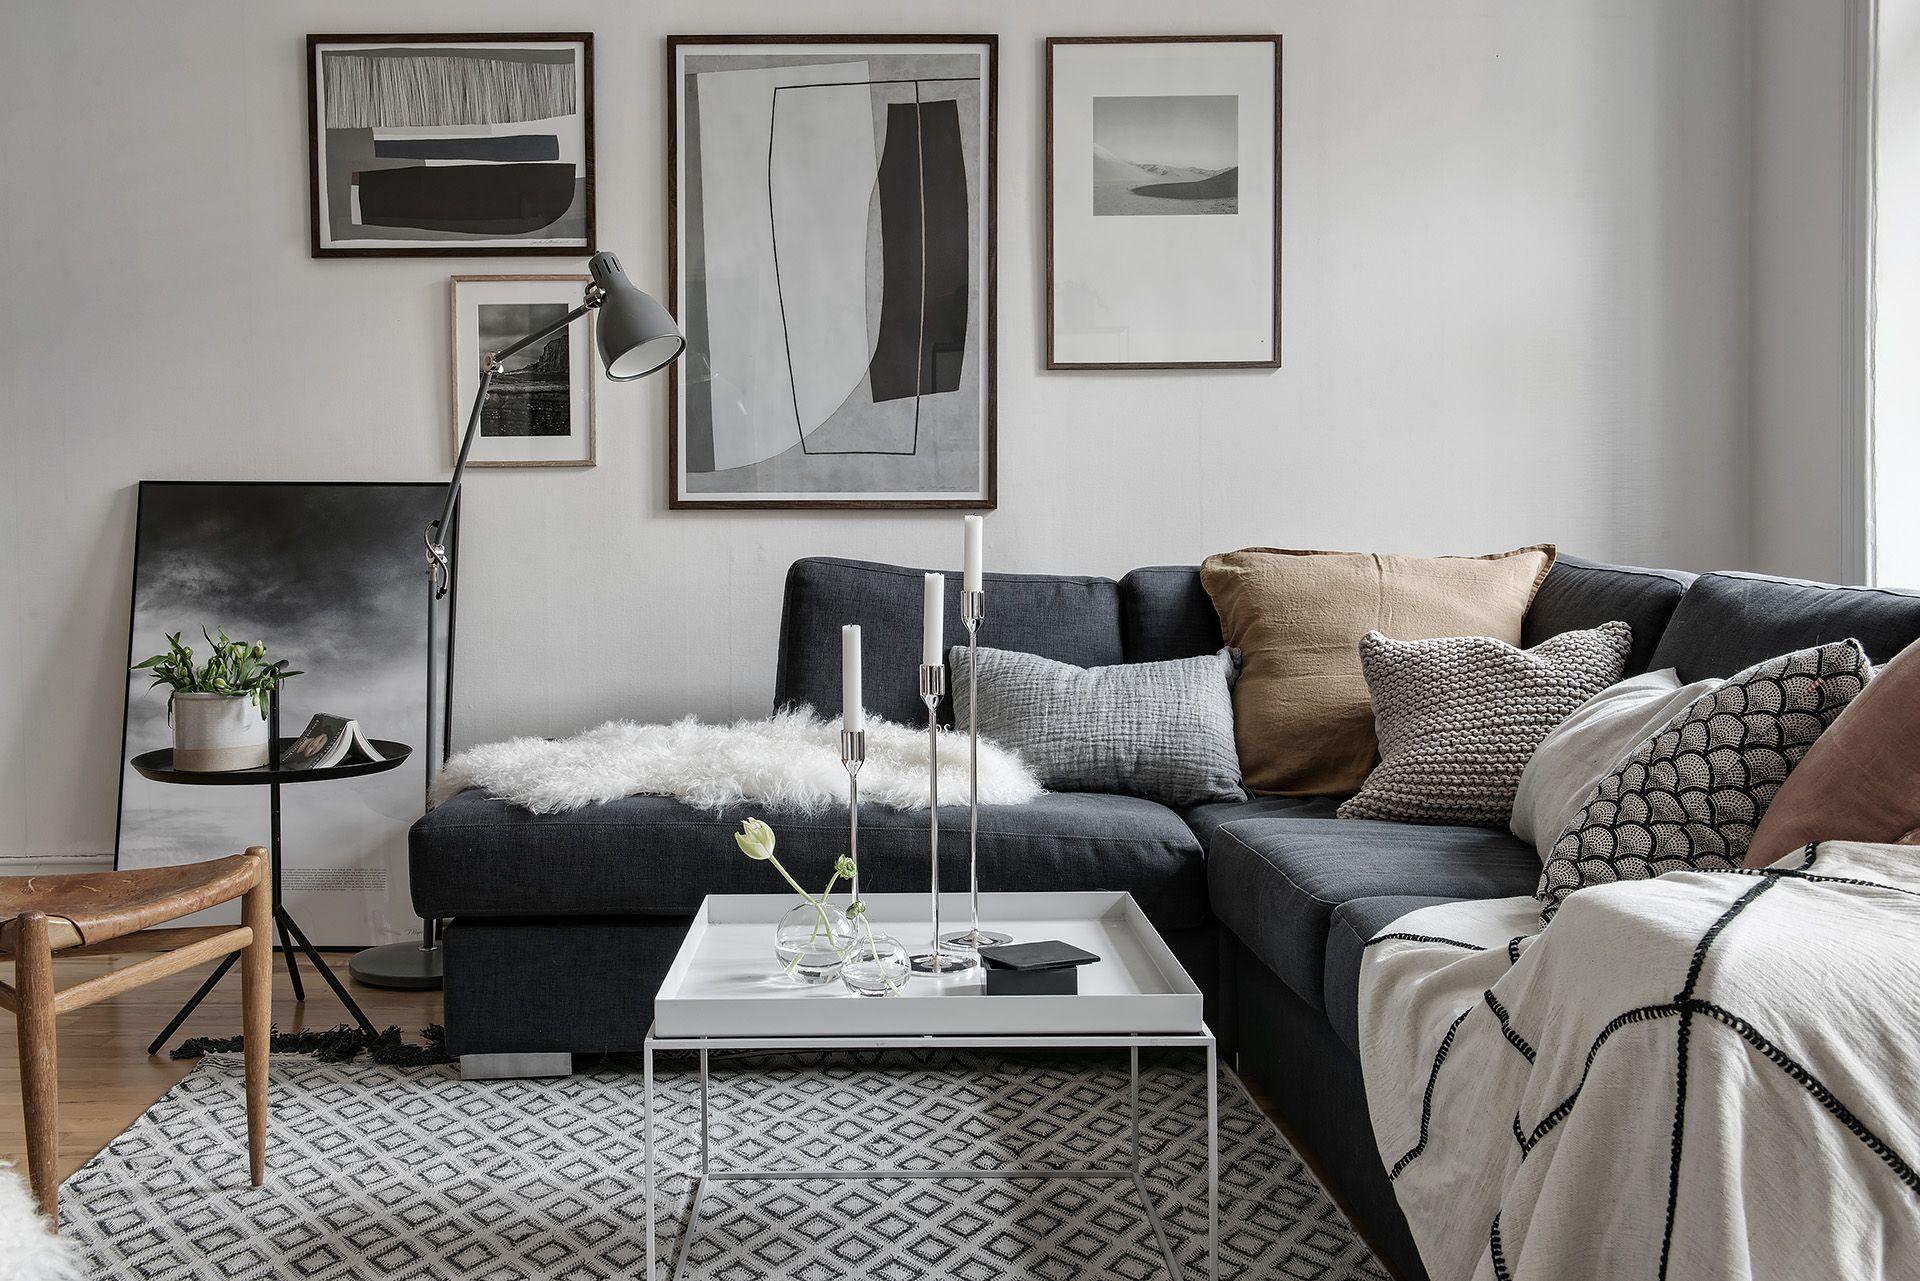 Olivedalsgatan 15 B Modern Farmhouse Living Room Decor Cosy Living Room Scandinavian Design Living Room